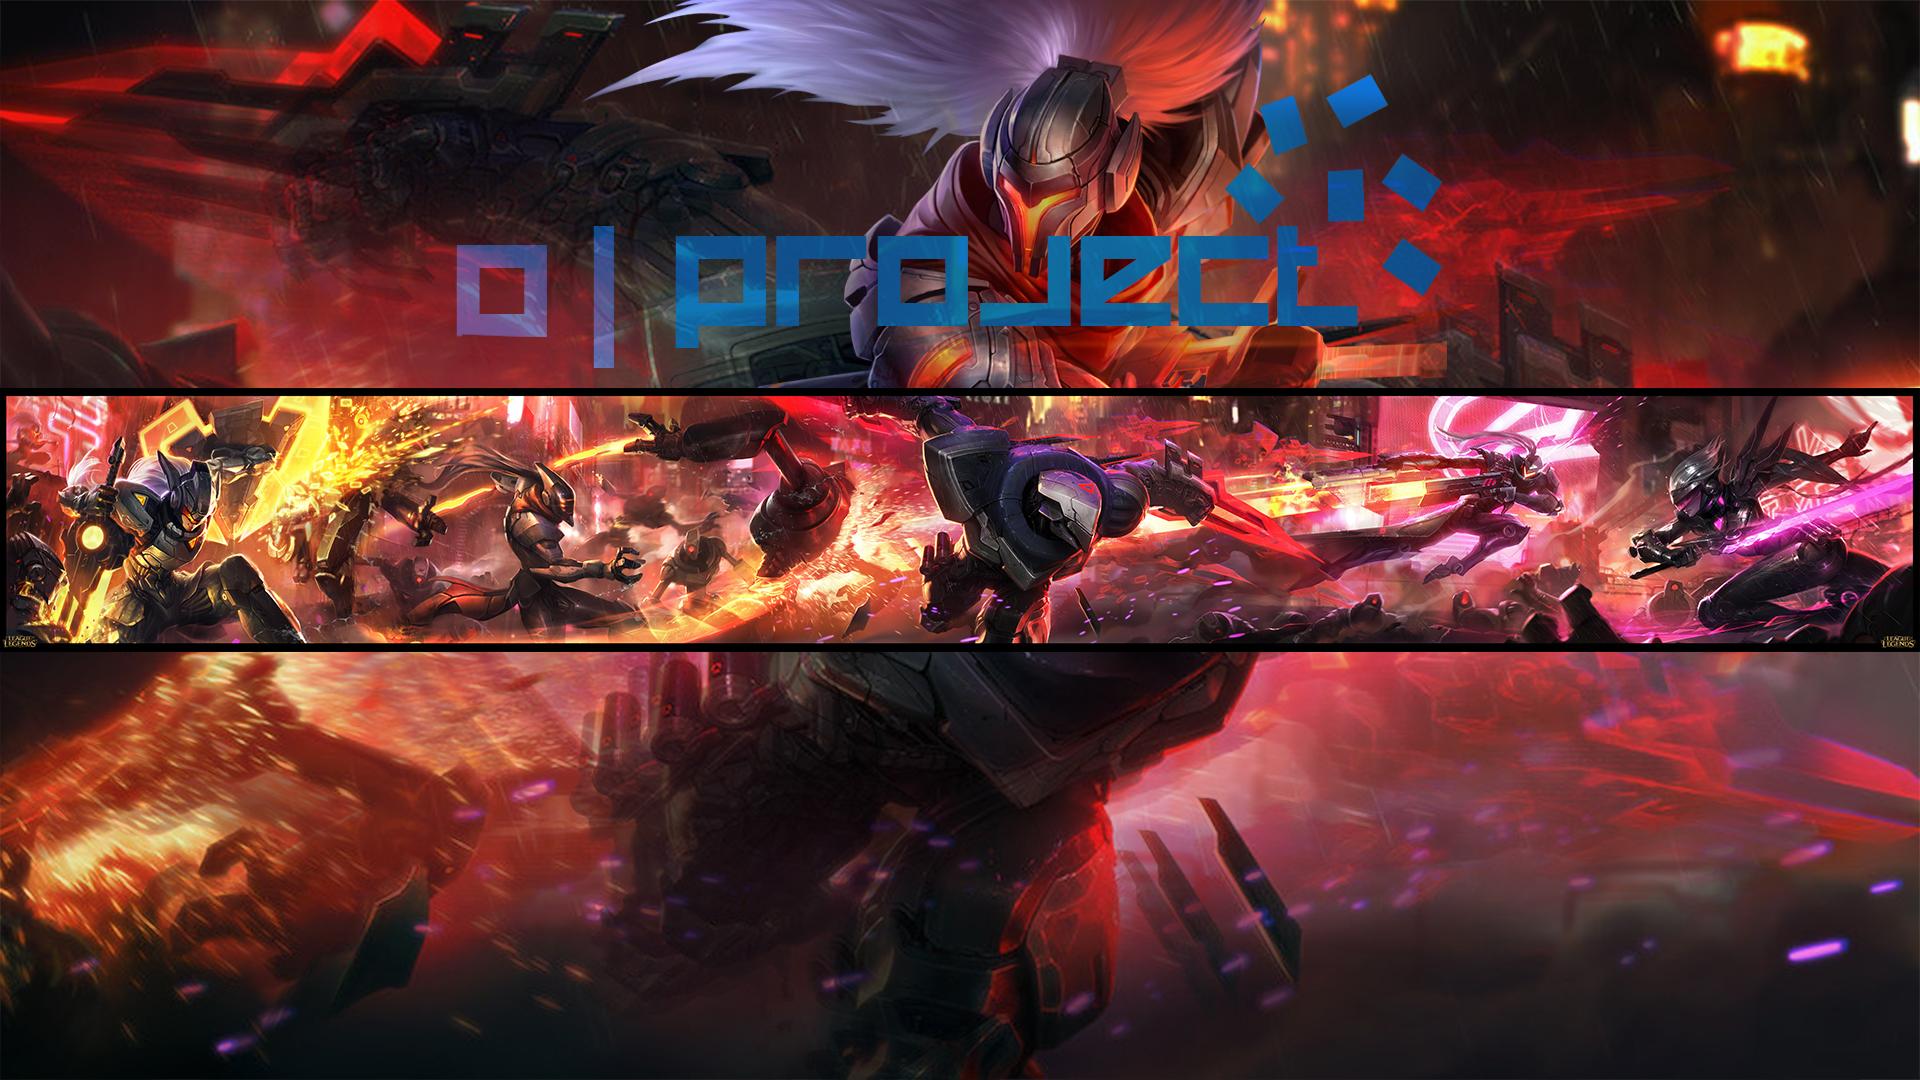 League Of Legends Wallpaper Project By Zeddashadowmaster On Deviantart